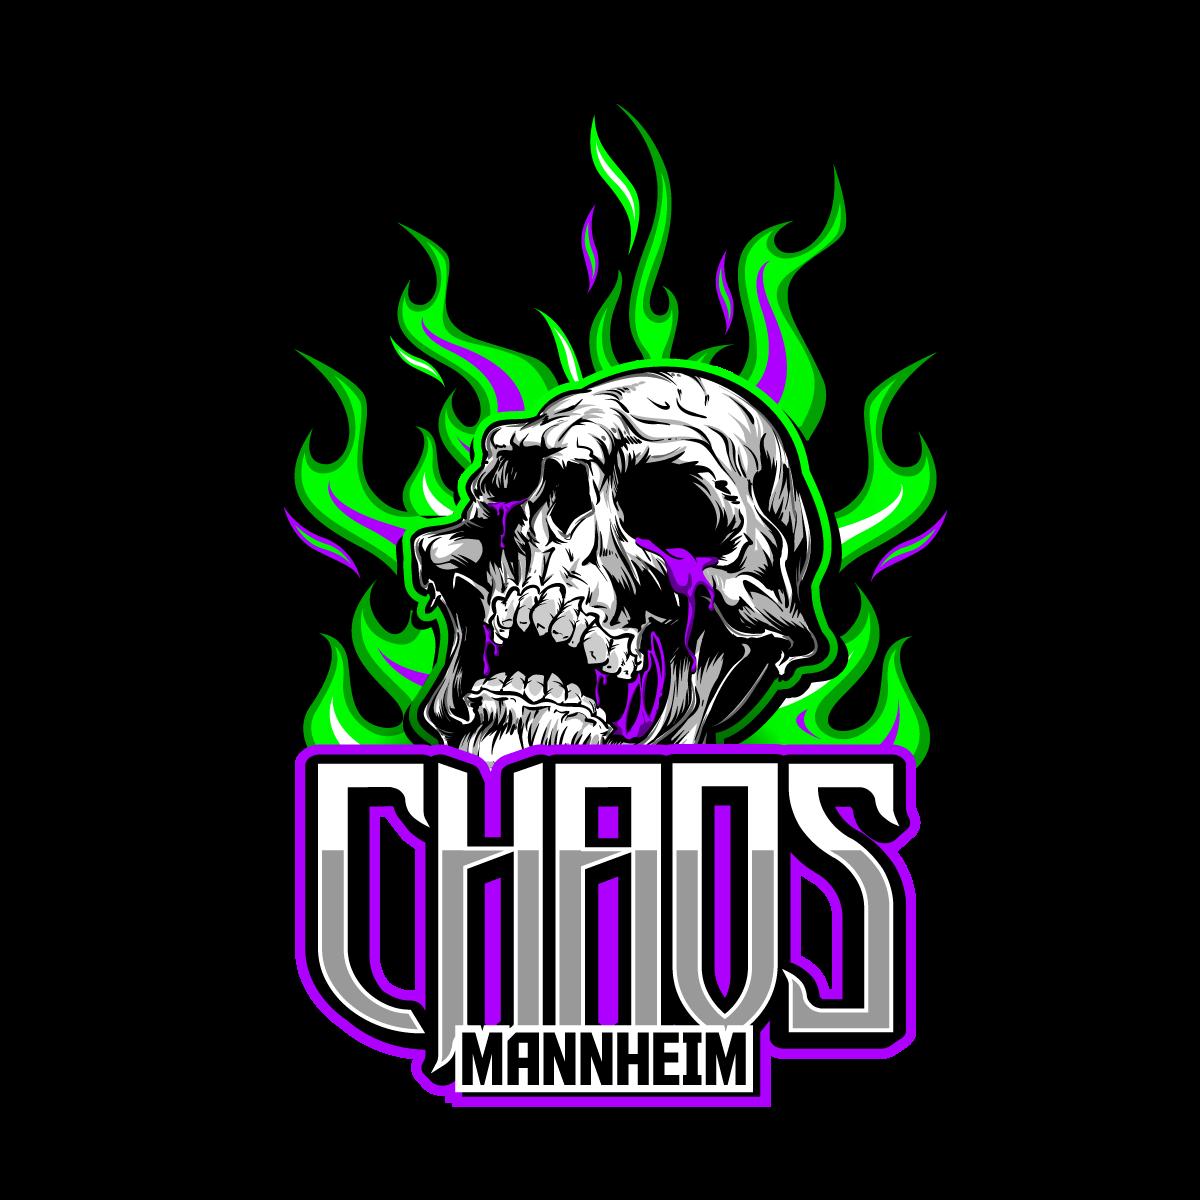 Chaos Mannheim